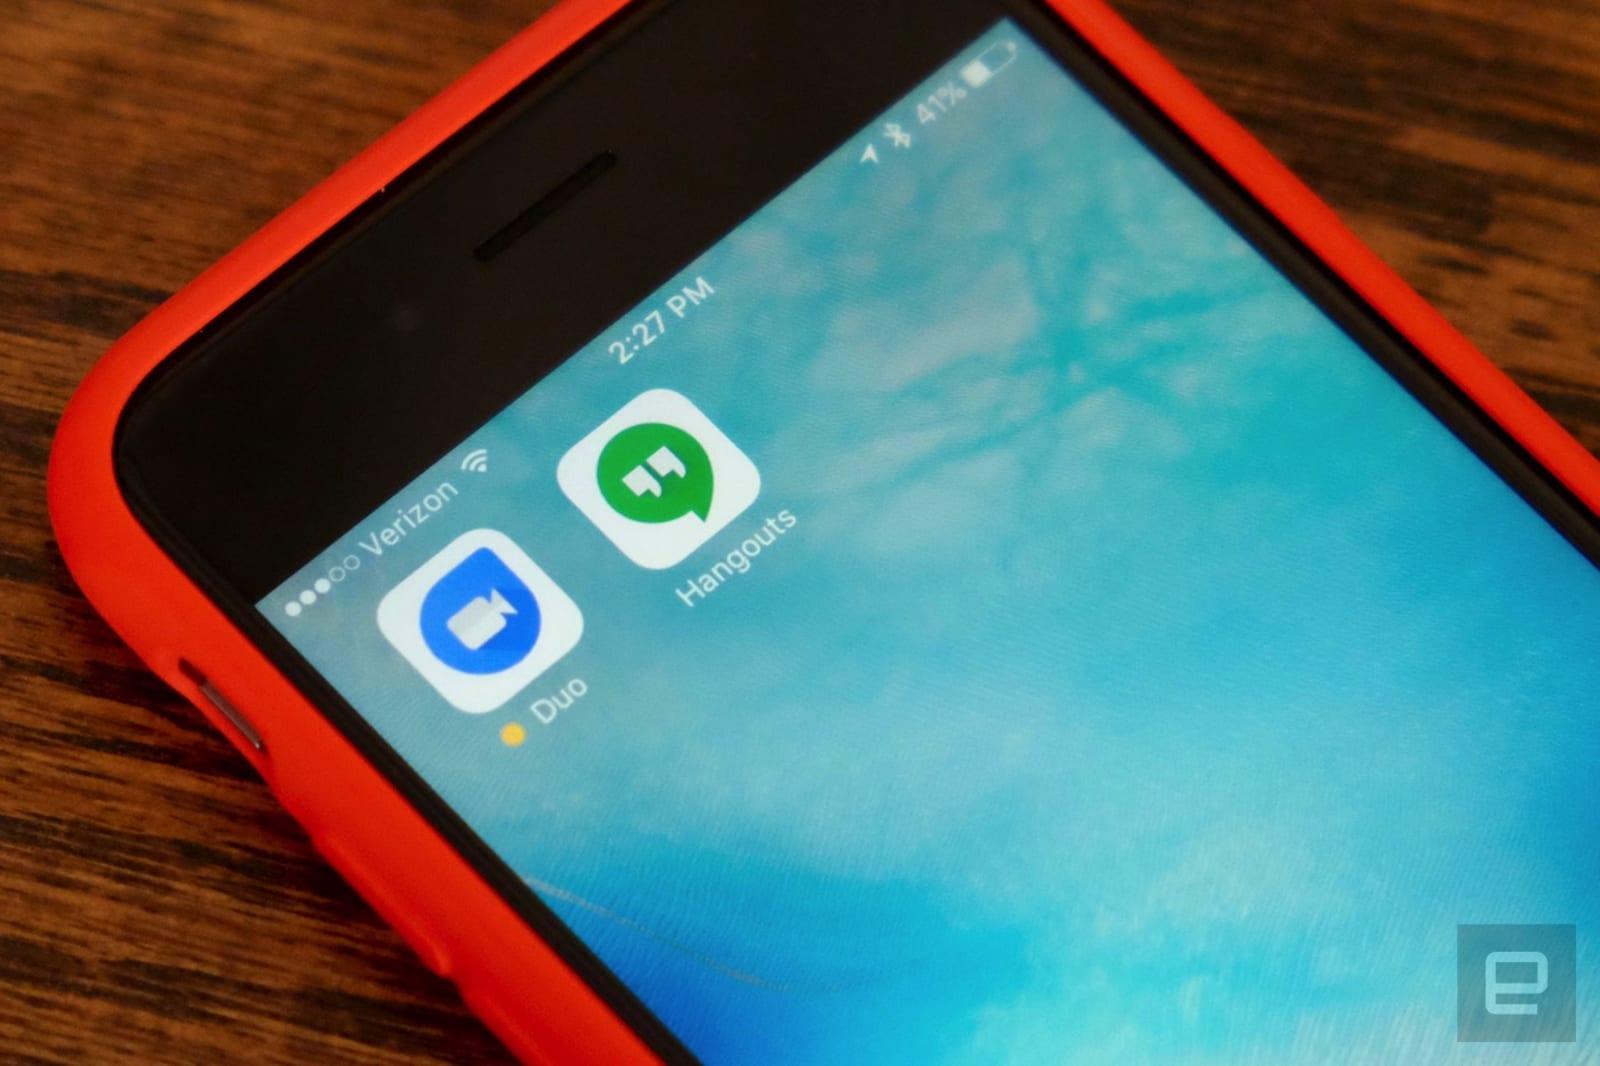 Rumor claims Google Hangouts will shut down in 2020 (updated)